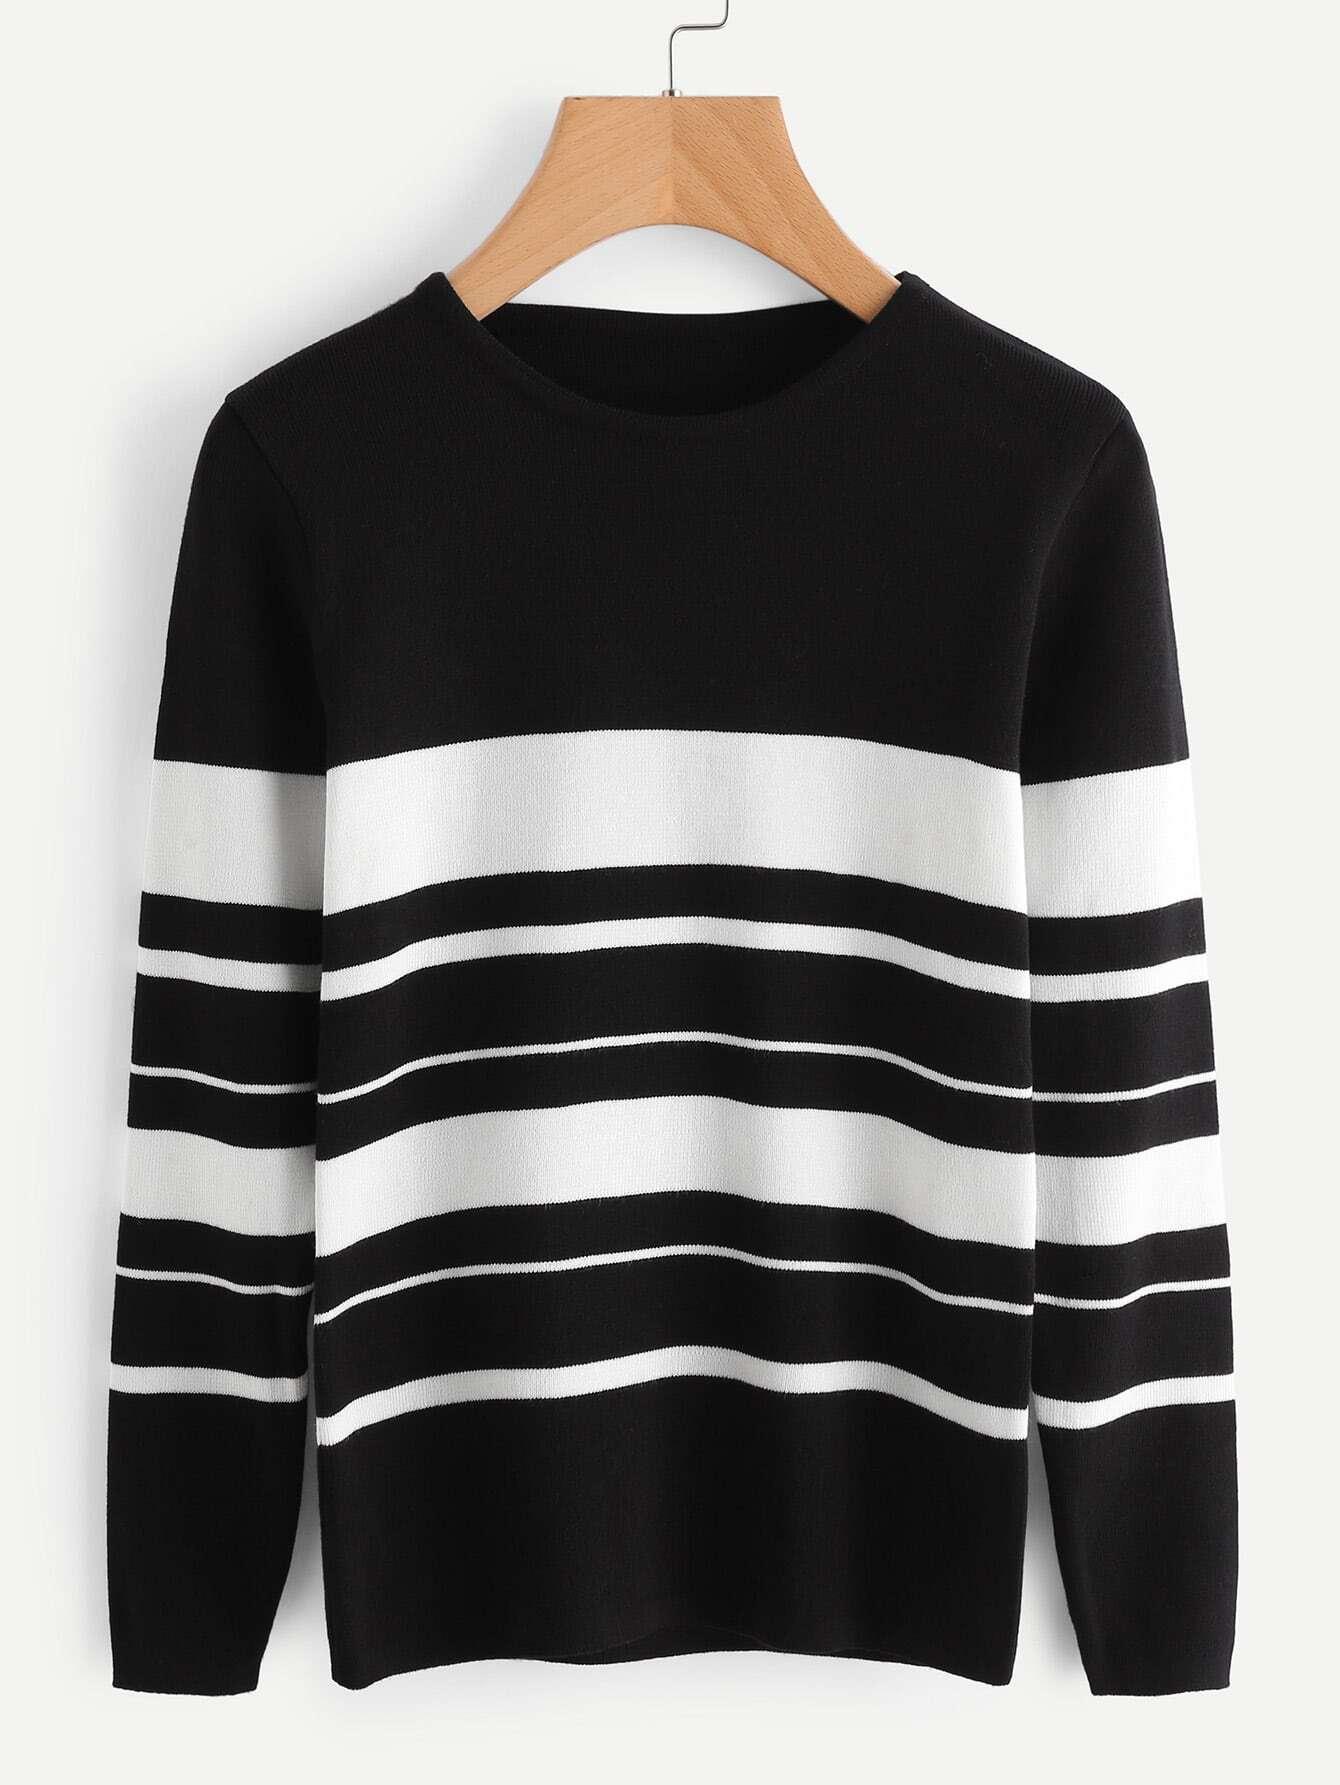 Striped Jersey Sweater sweater170824102